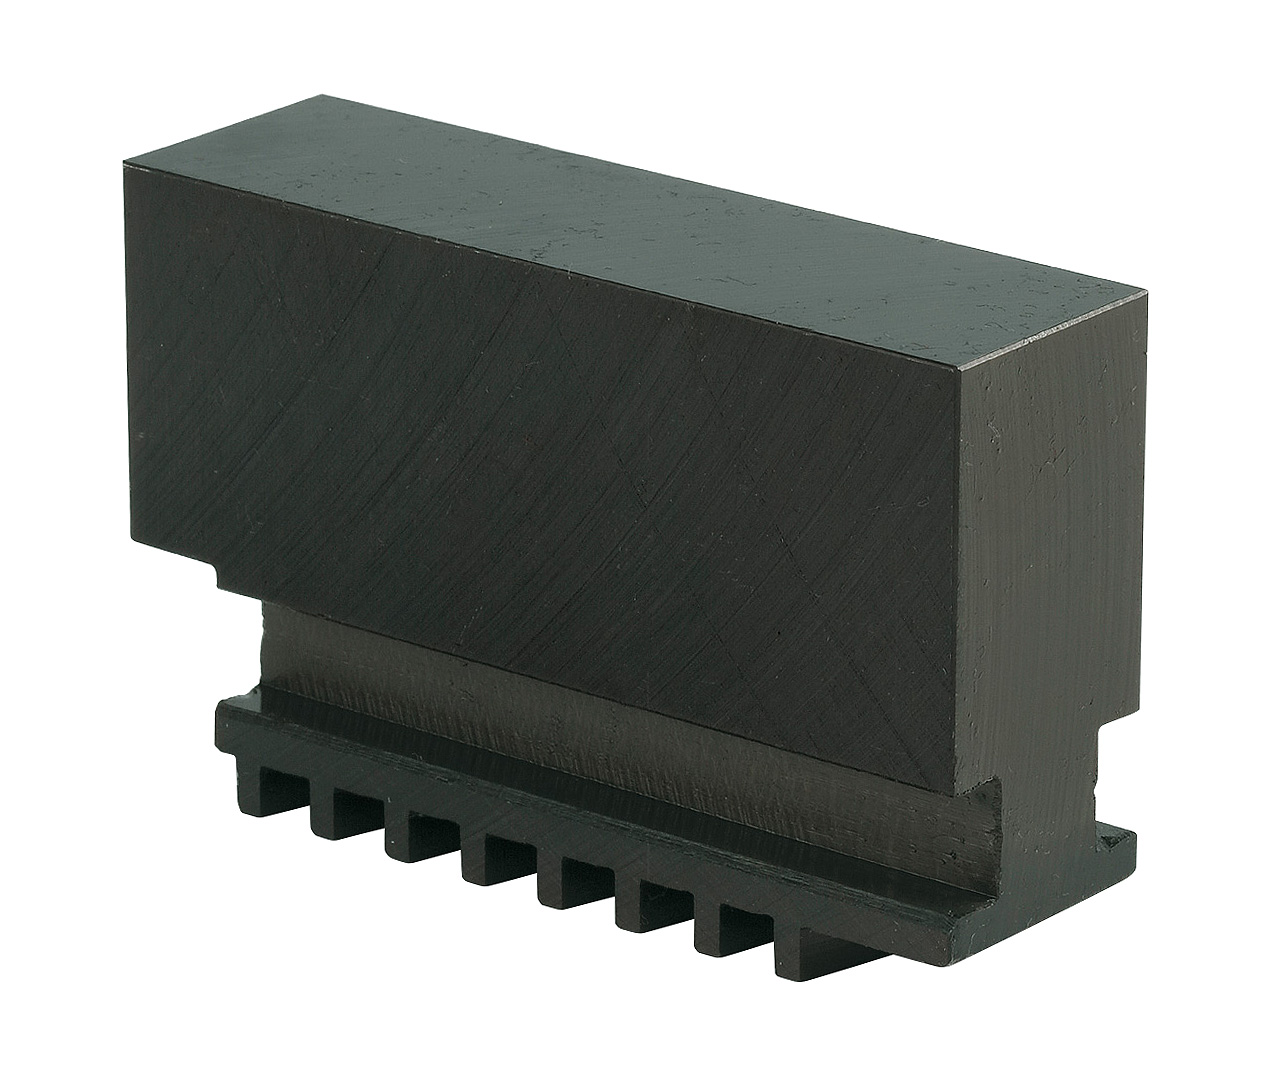 Szczęki jednolite miękkie - komplet DSJ-DK12-100 BERNARDO